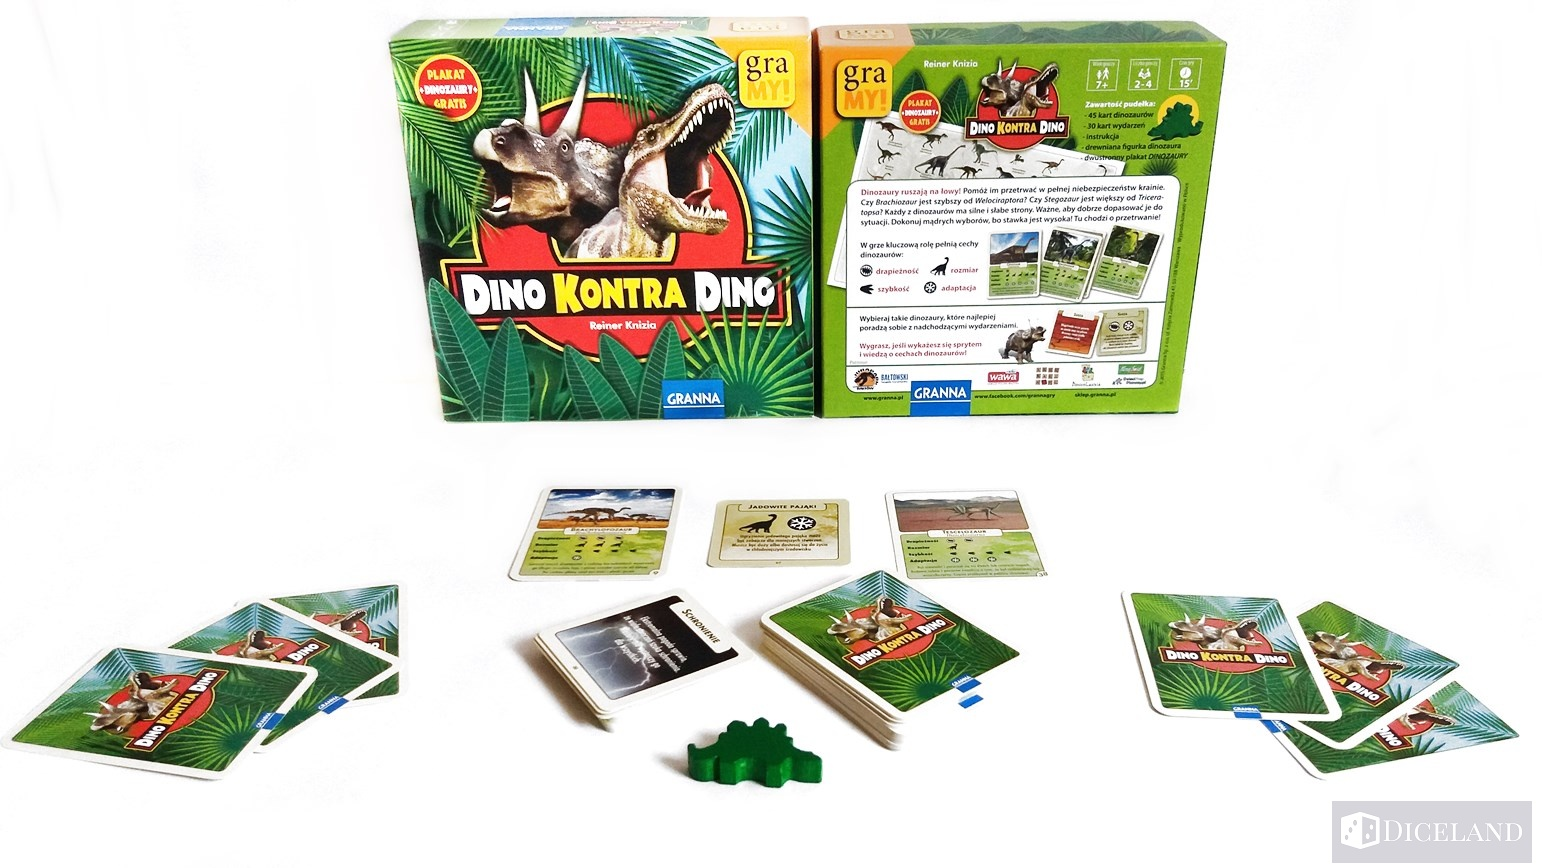 Dino kontra Dino 20 Recenzja #37 Dino kontra Dino